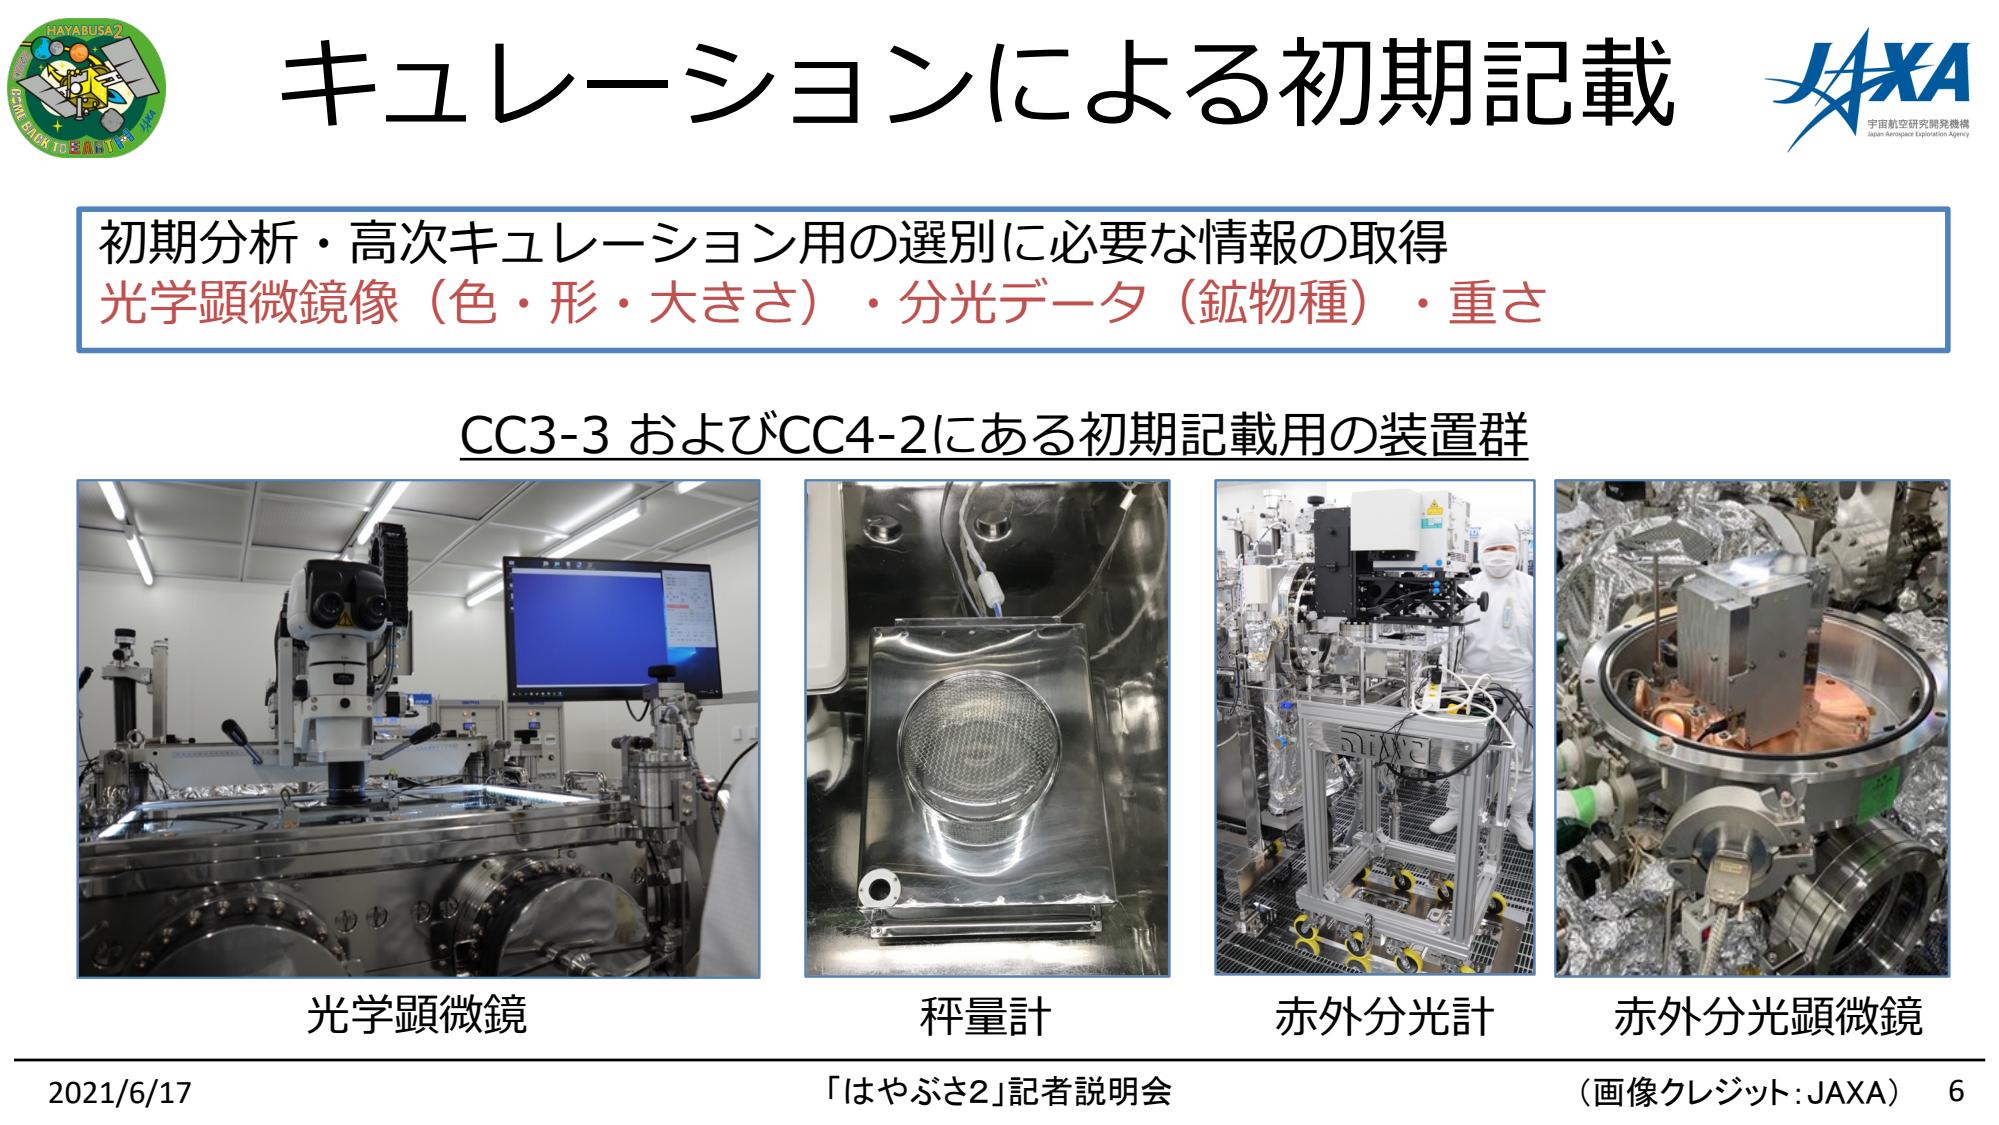 f:id:Imamura:20210617130135p:plain